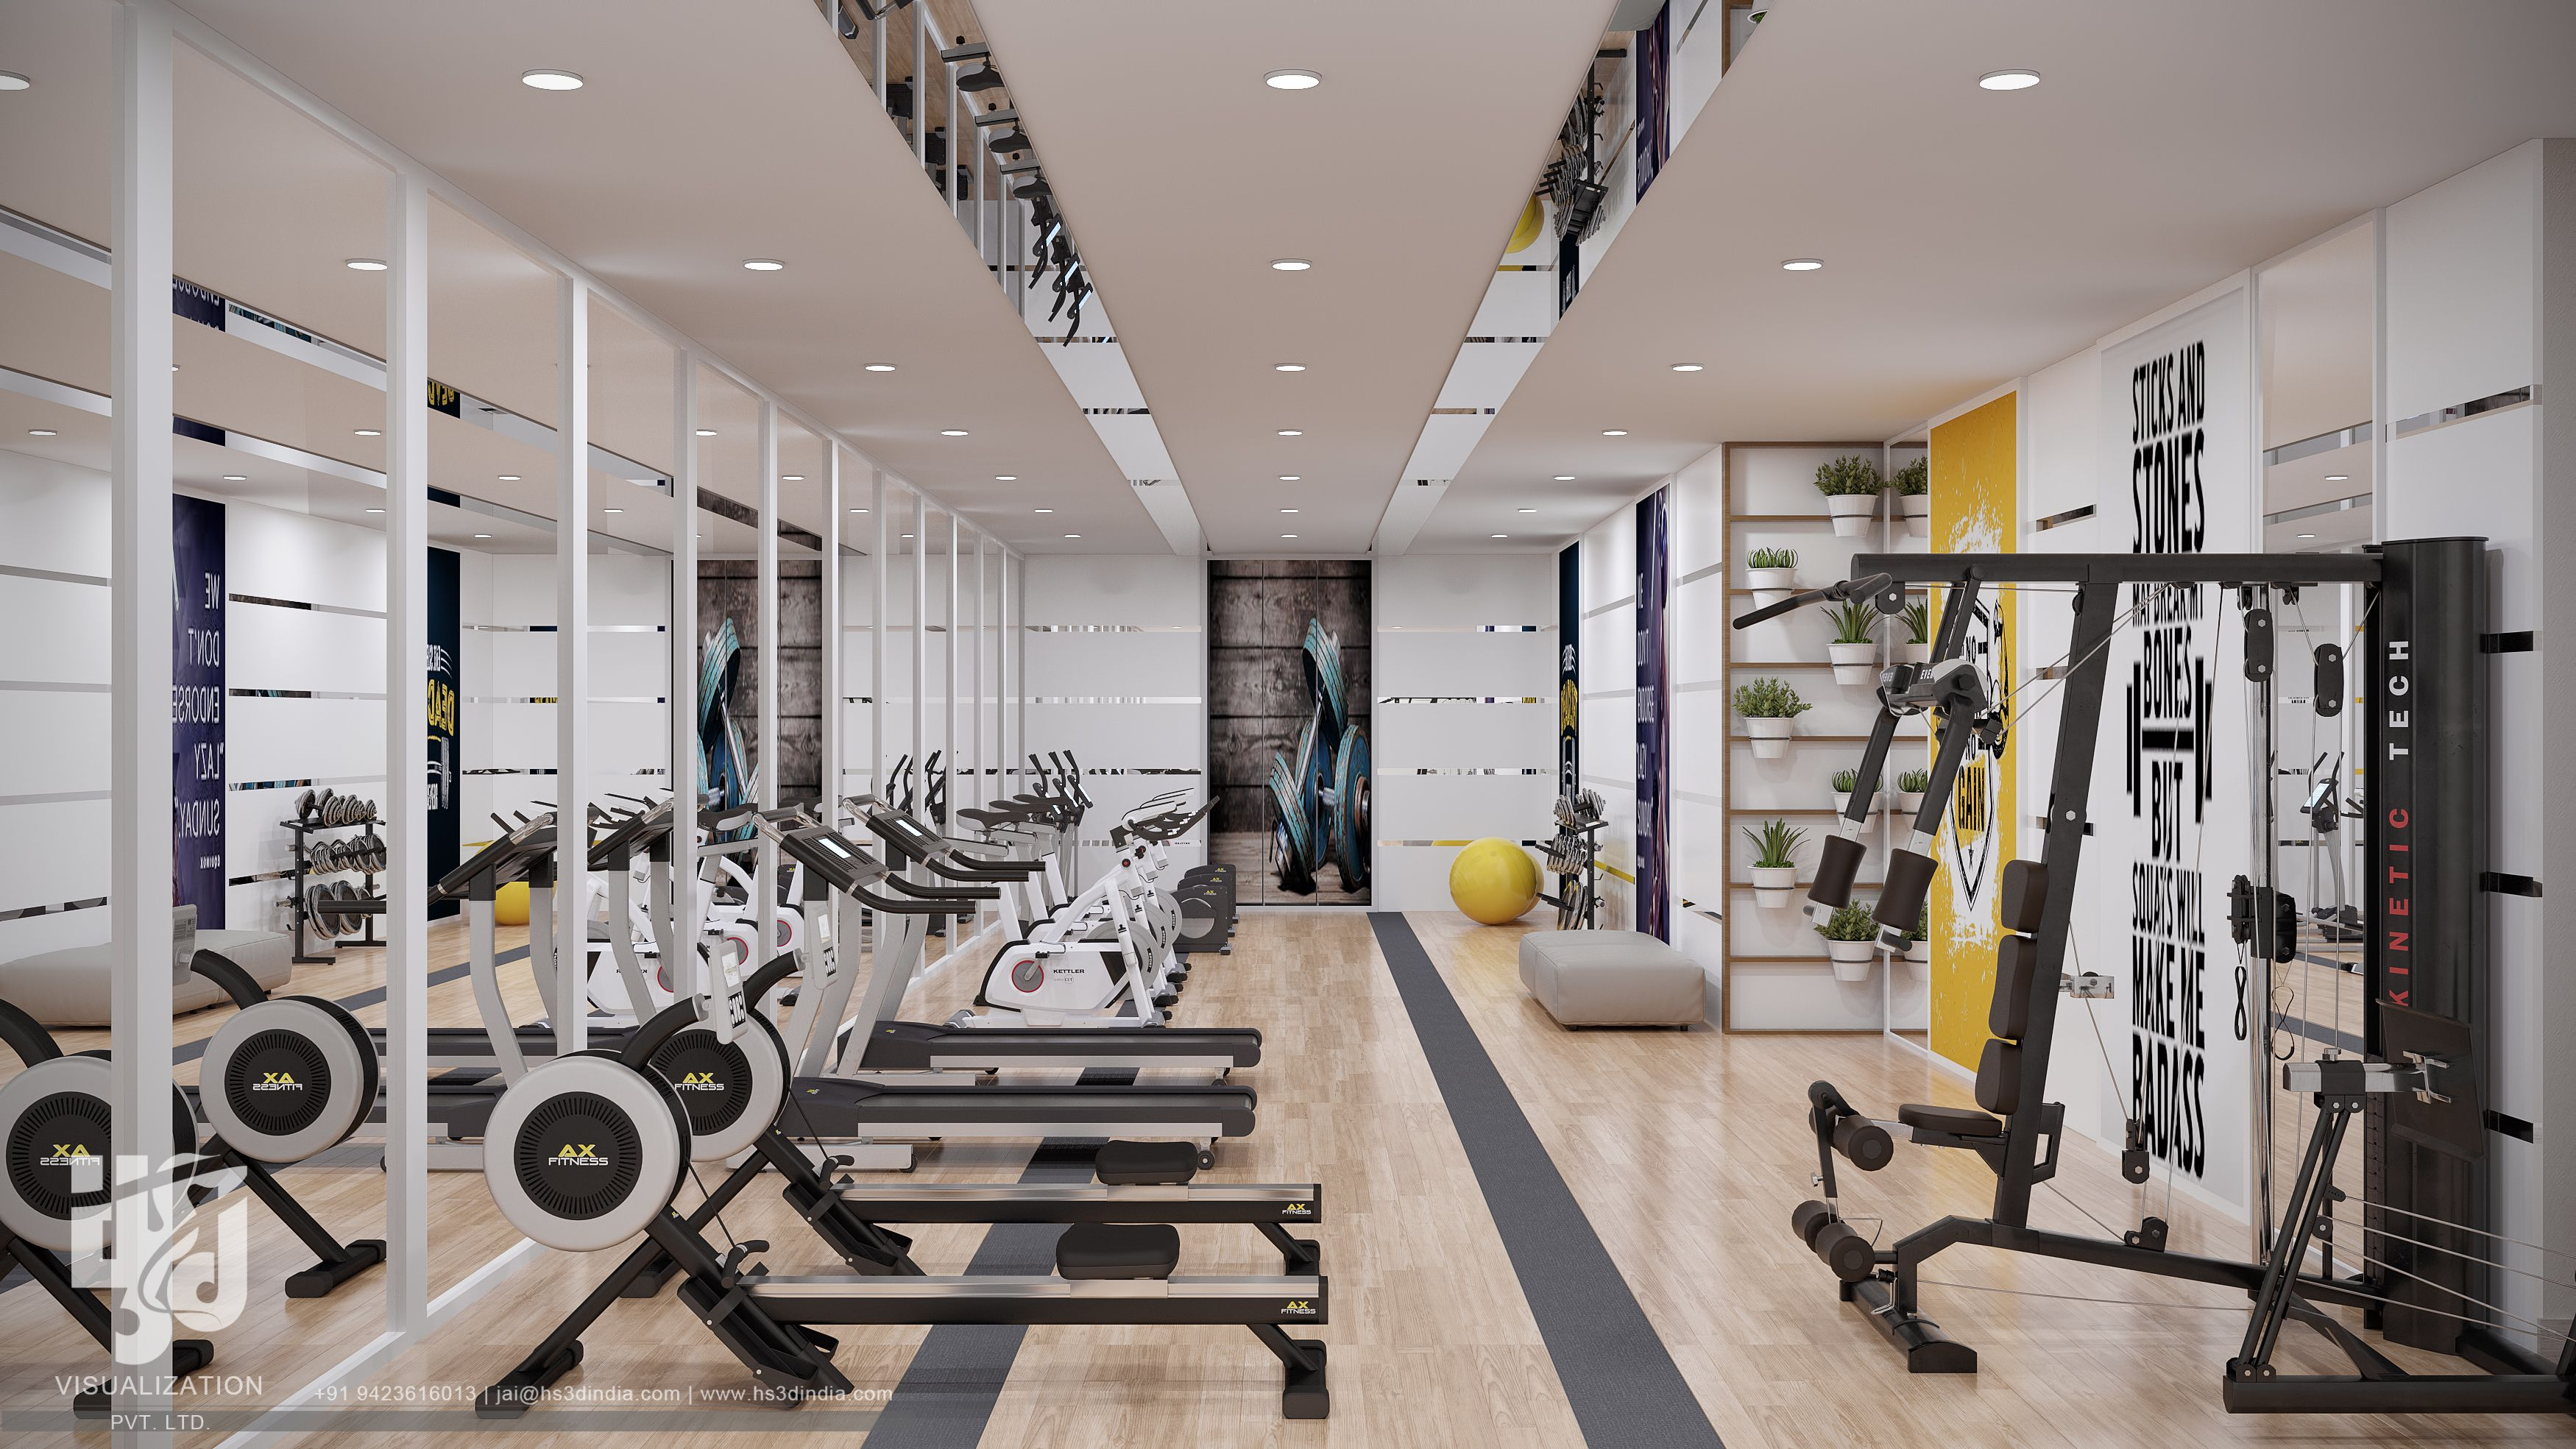 Fitness Studio 3d Visualization Fitness Studio Gym Fitness Motivation Commercial Fitness